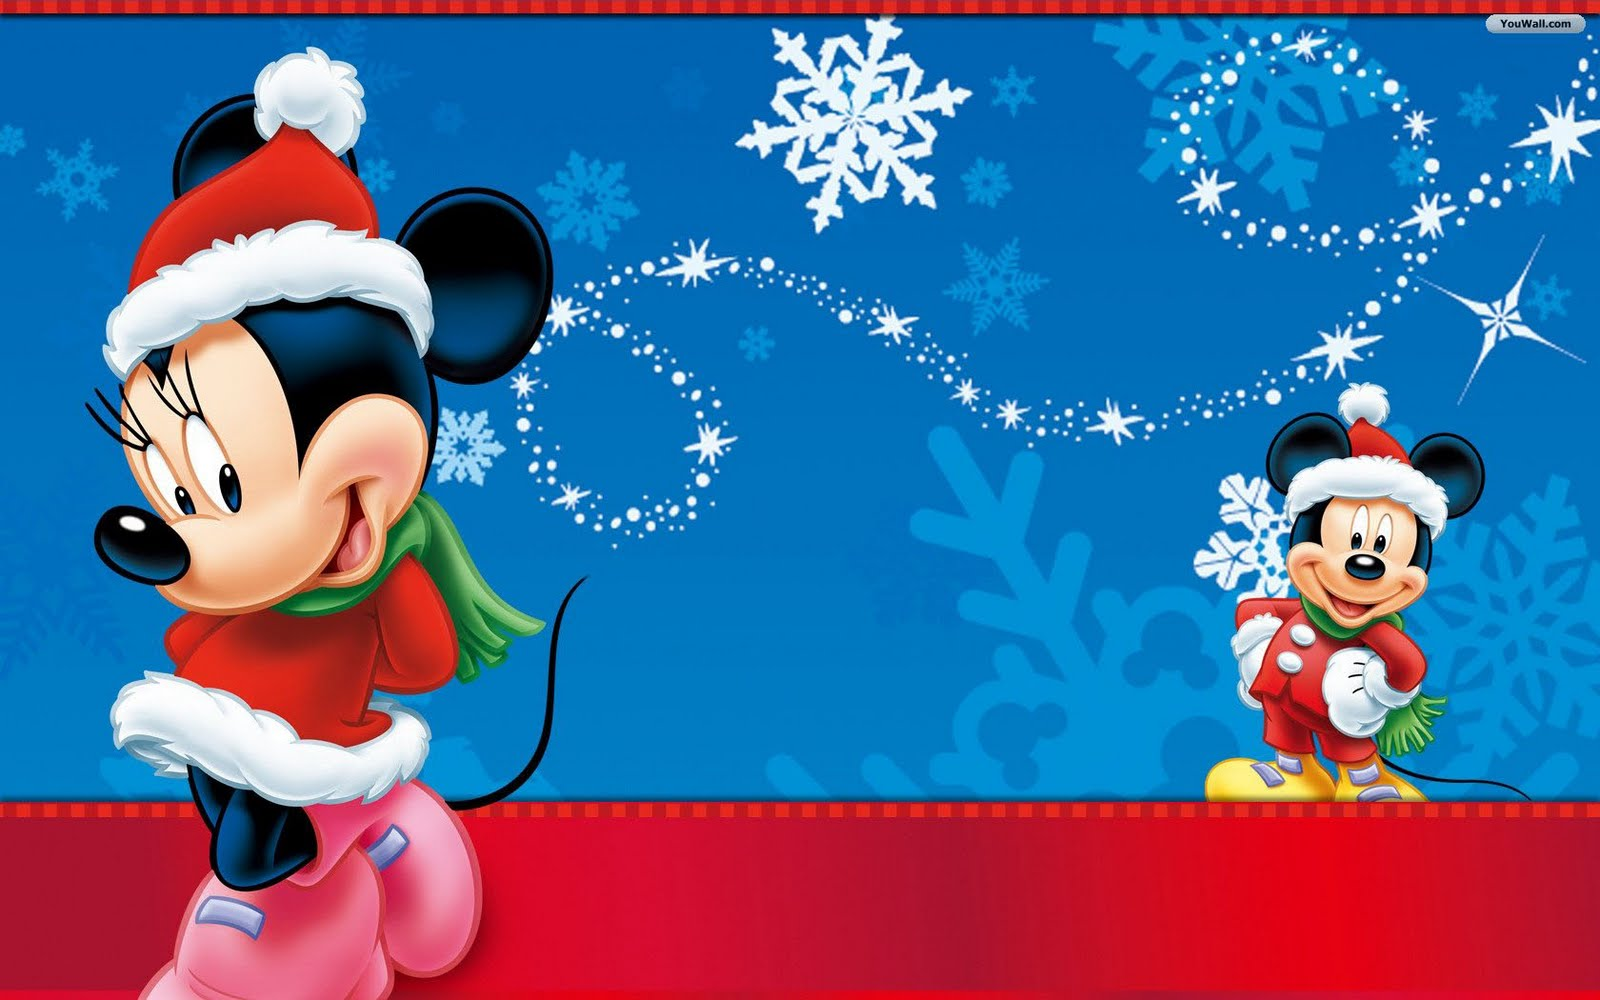 Wallpaper Mansion Disney Christmas Wallpapers 1600x1000